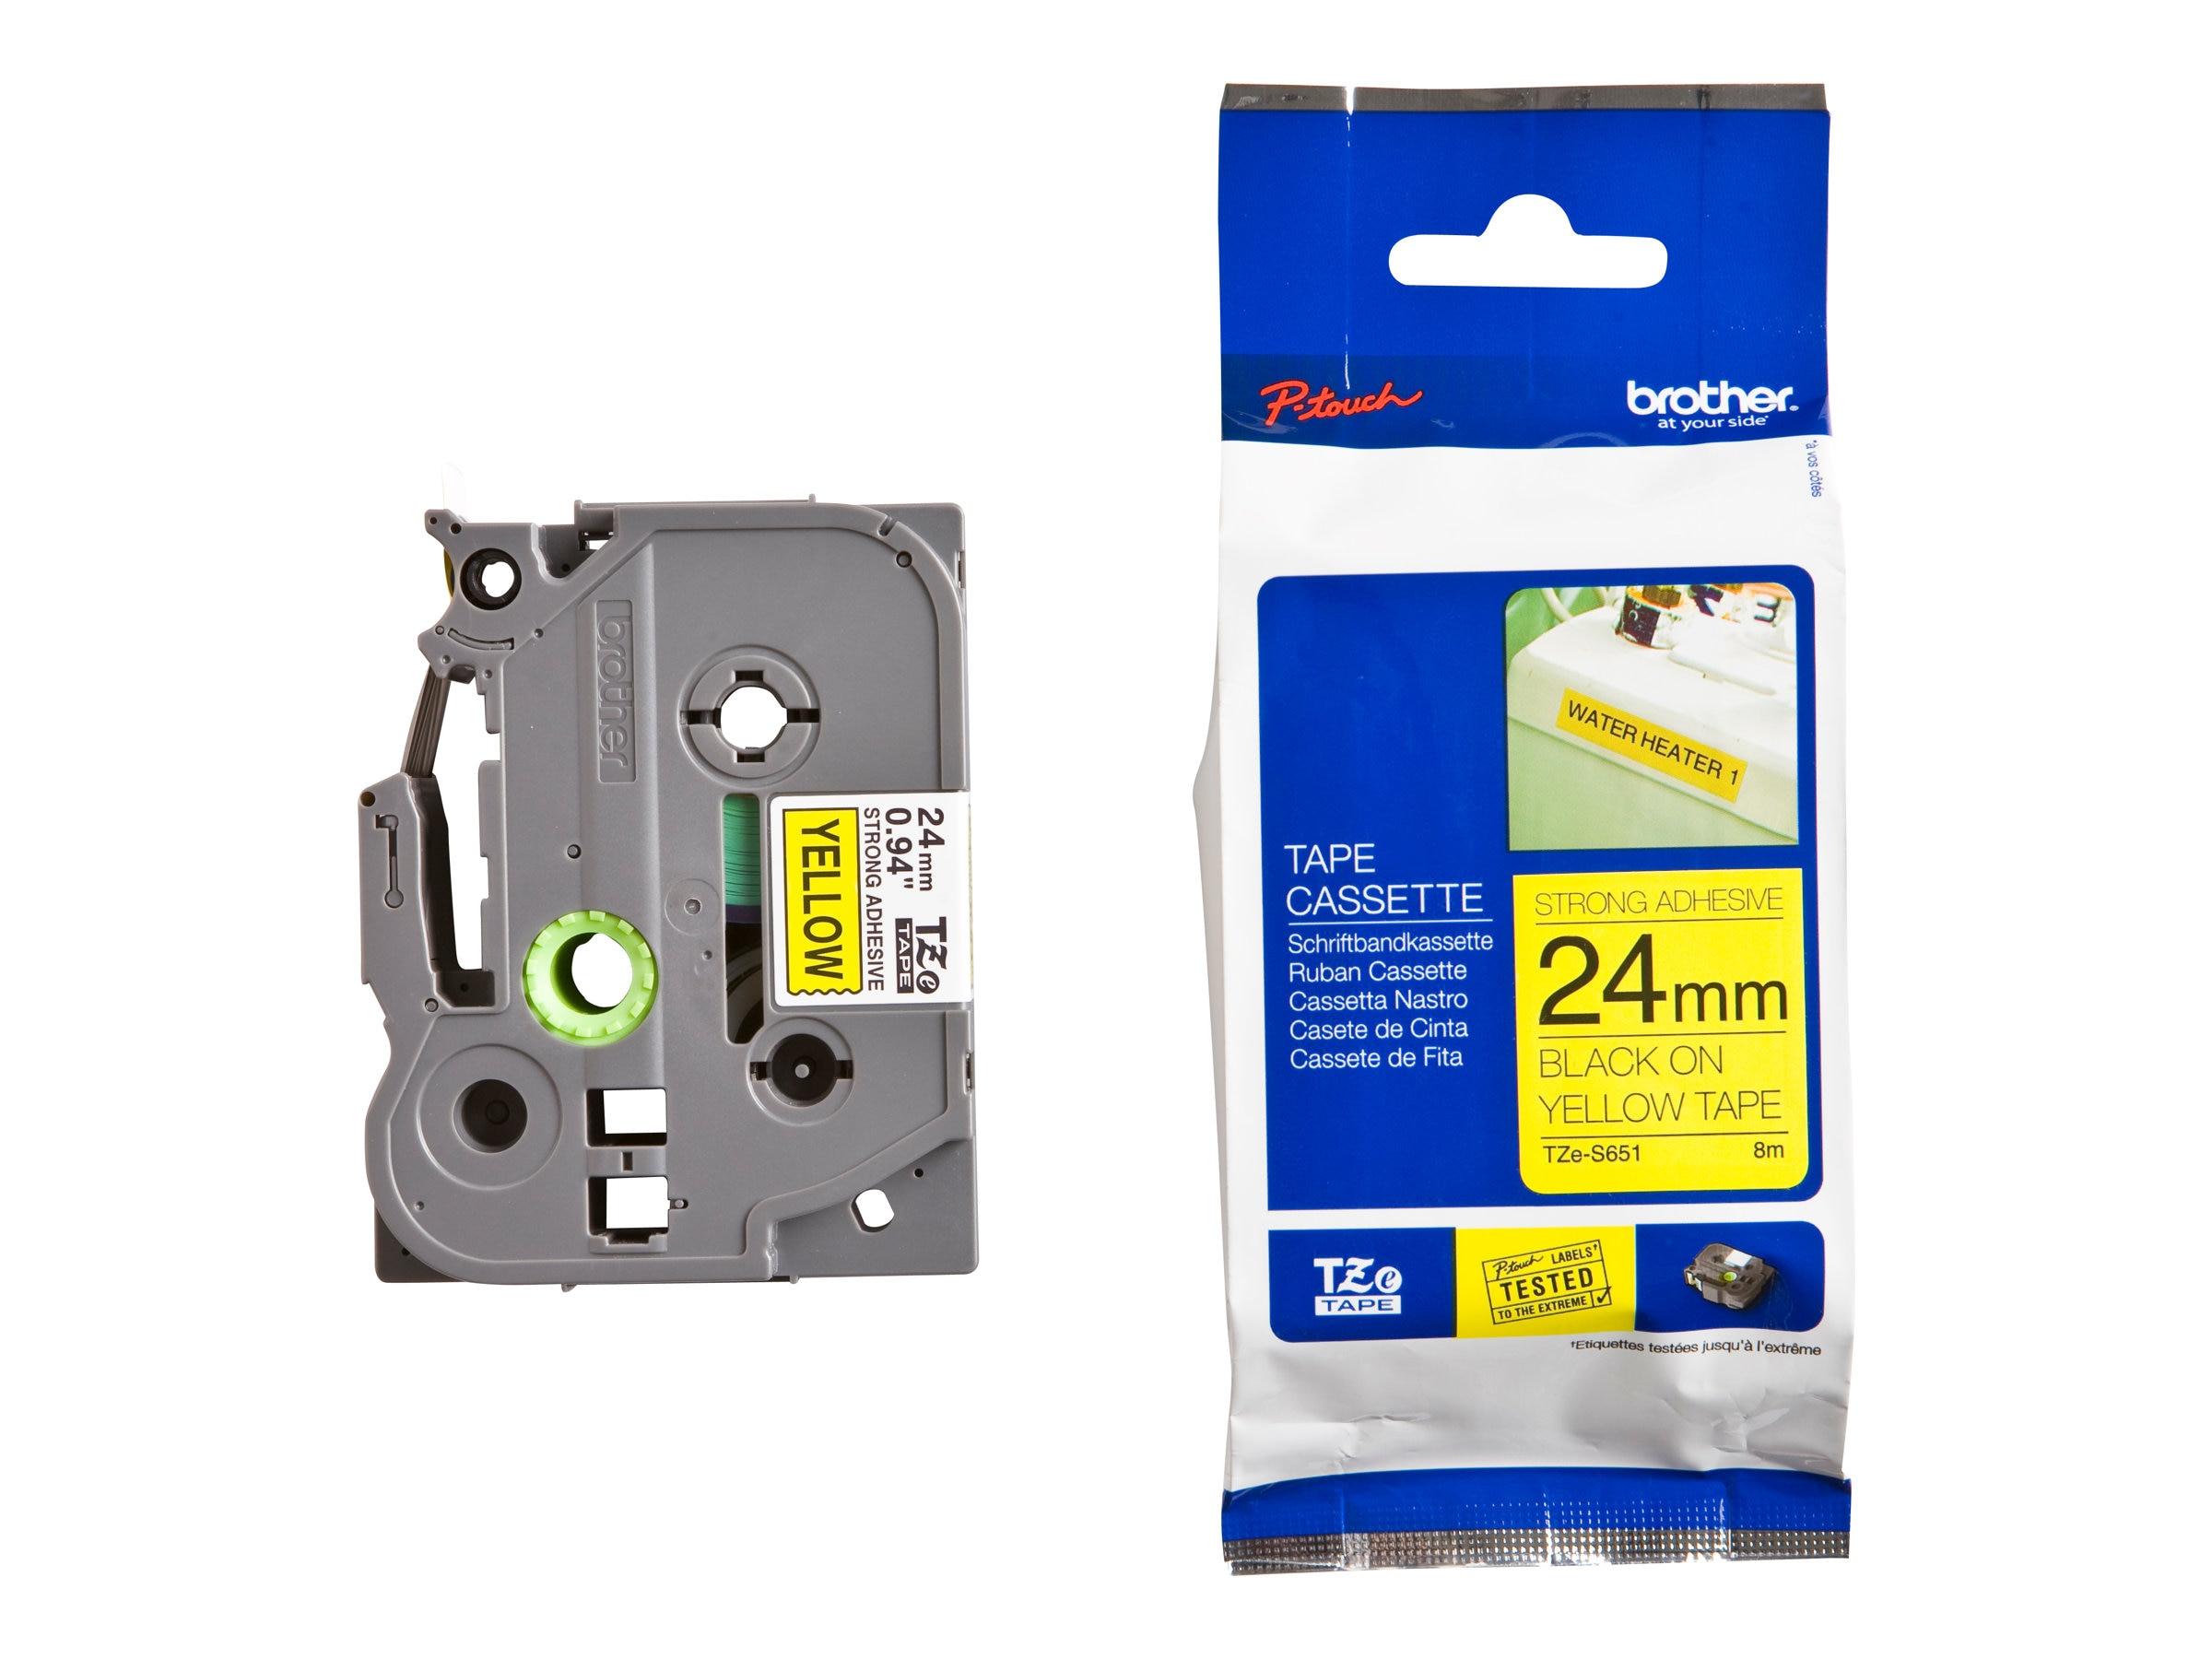 Brother 0.94 x 26.2' TZeS651 Black on Yellow Tape w  Extra Strength Adhesive